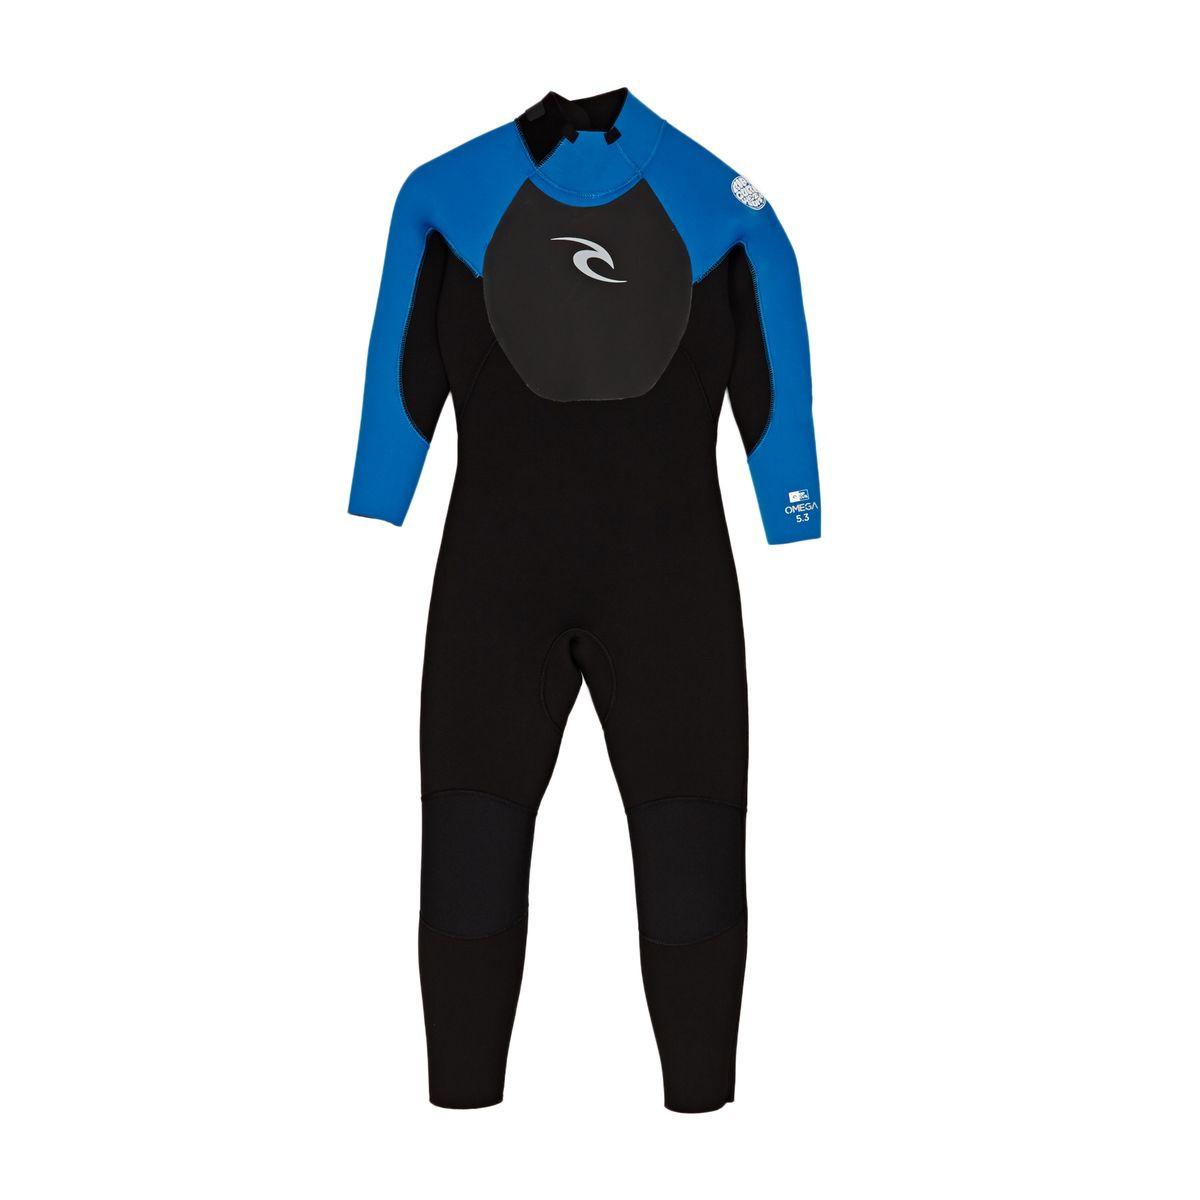 Rip Curl Kids 5mm Omega Steamer Wetsuit - Blue